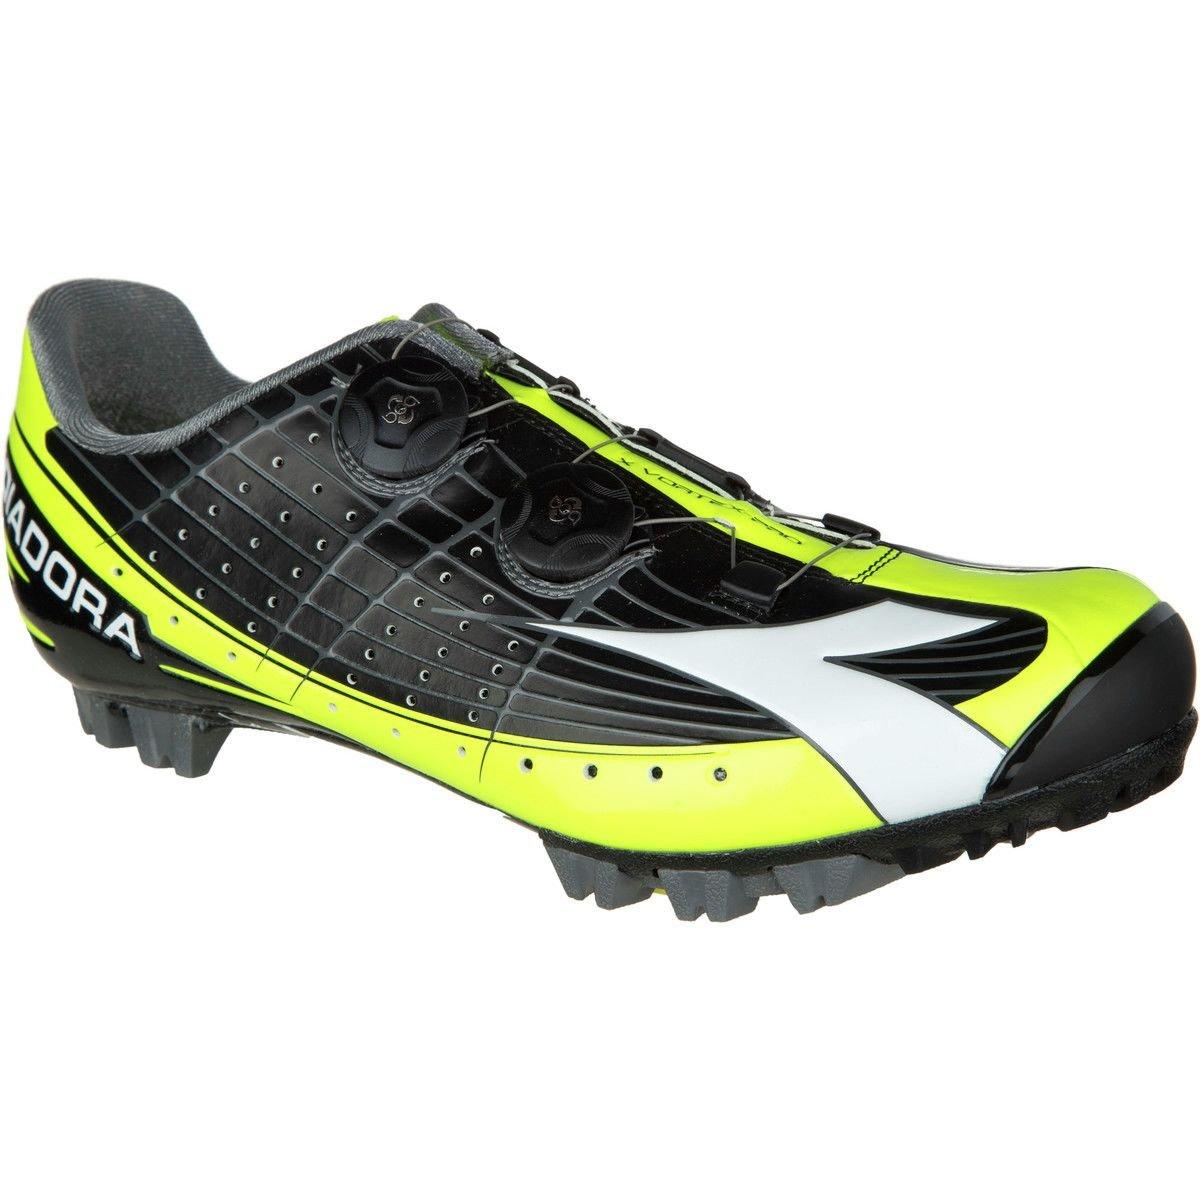 Scarpe da ciclismo Diadora MTB Diadora X vortex pro C1470